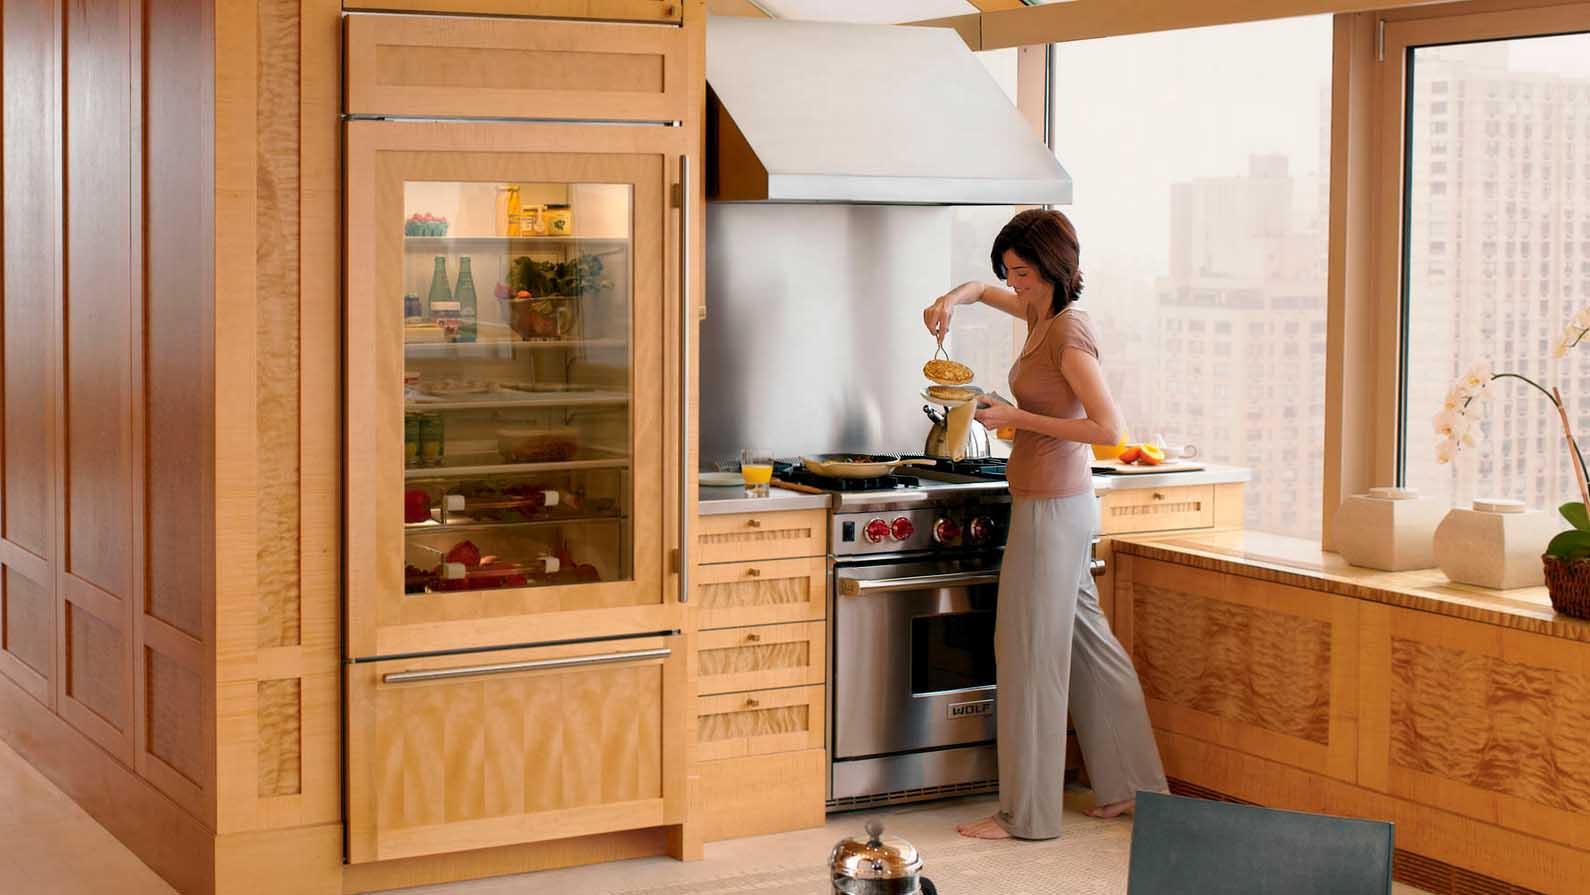 Kitchen Appliances Built In Built In Bottom Freezer Refrigerator Picks Appliances Connection